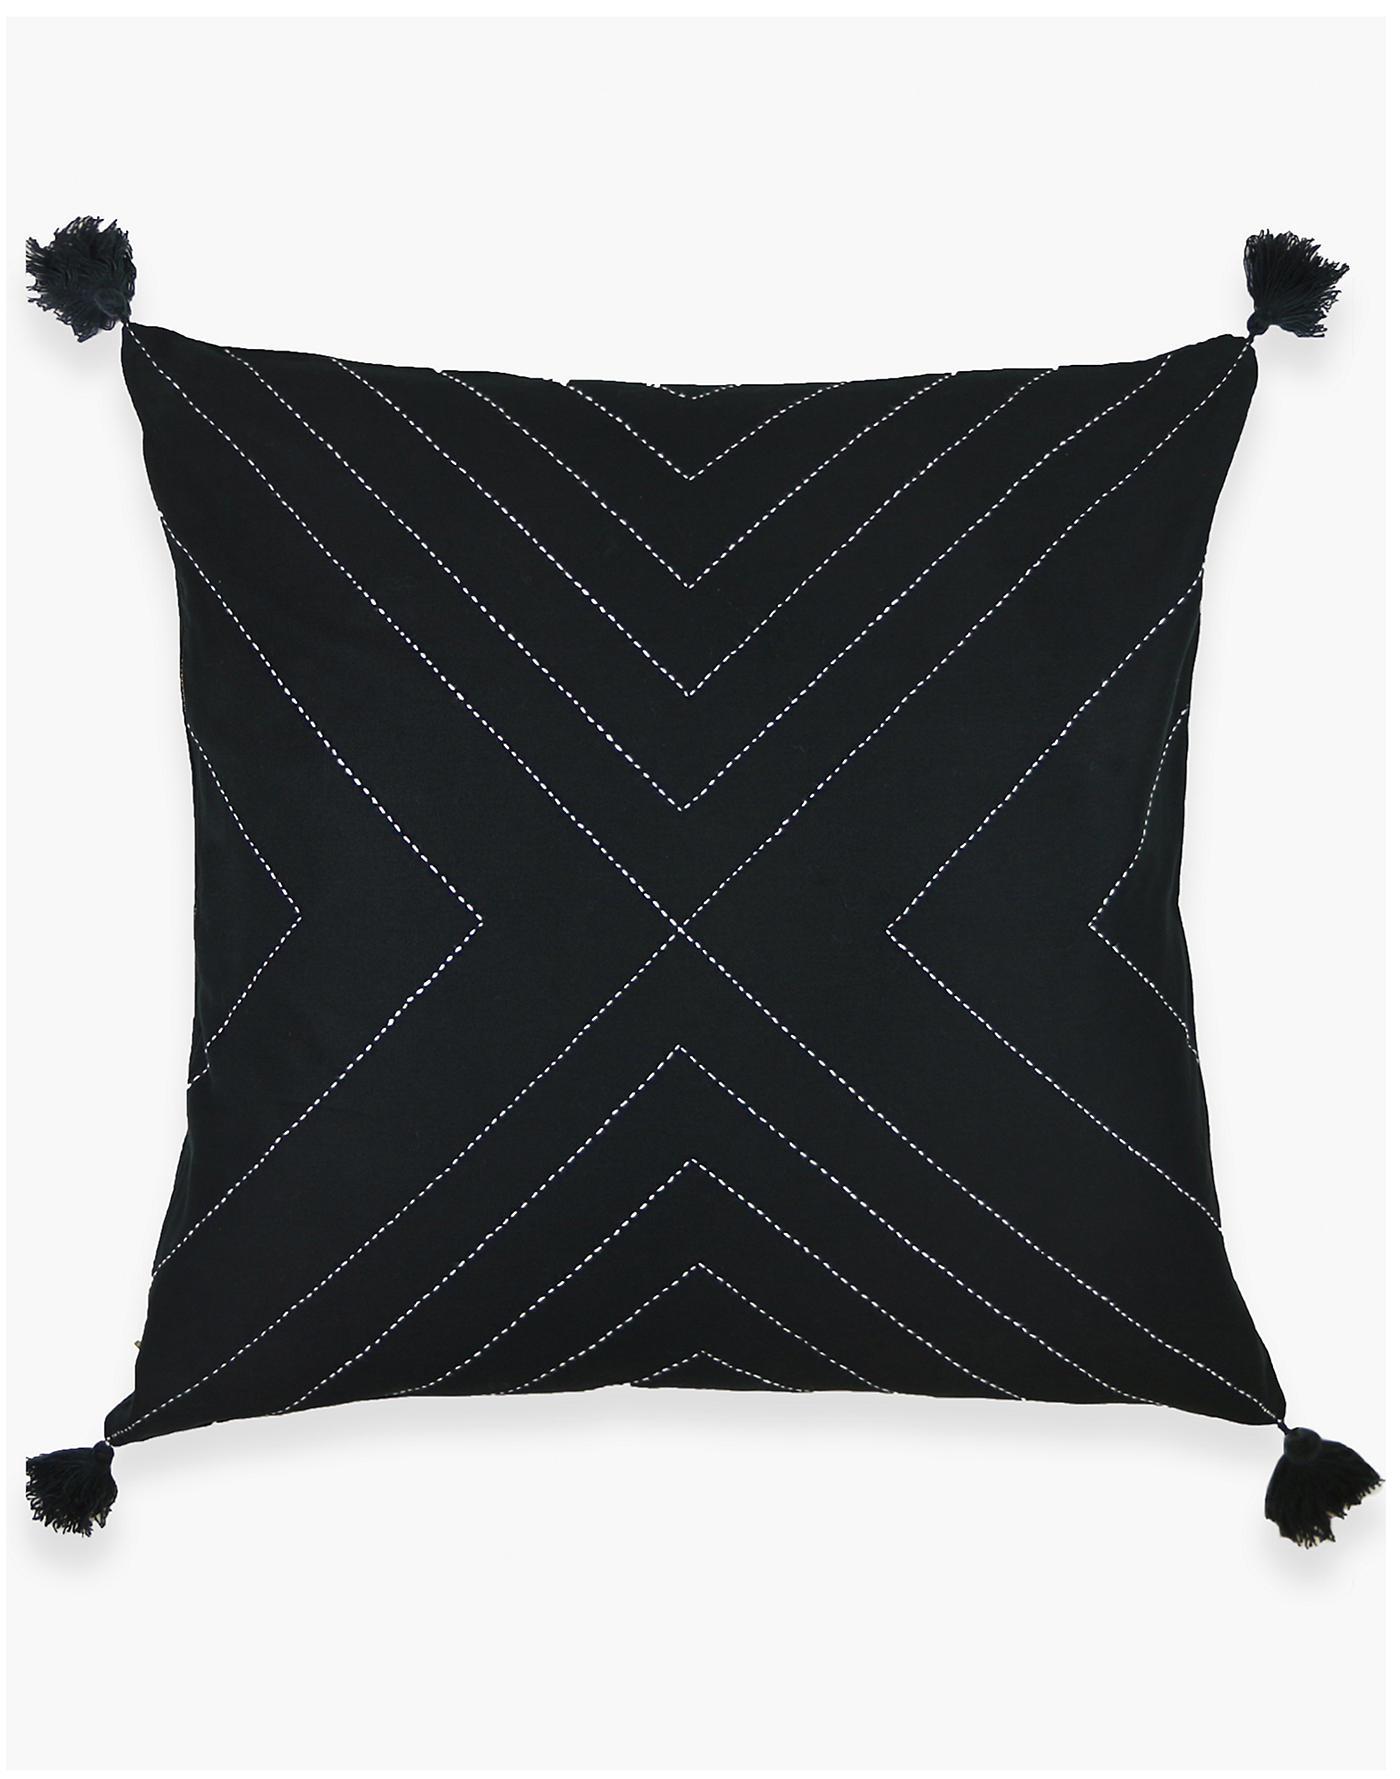 Madewell Anchal Organic Cotton Geometric Tassel Throw Pillow